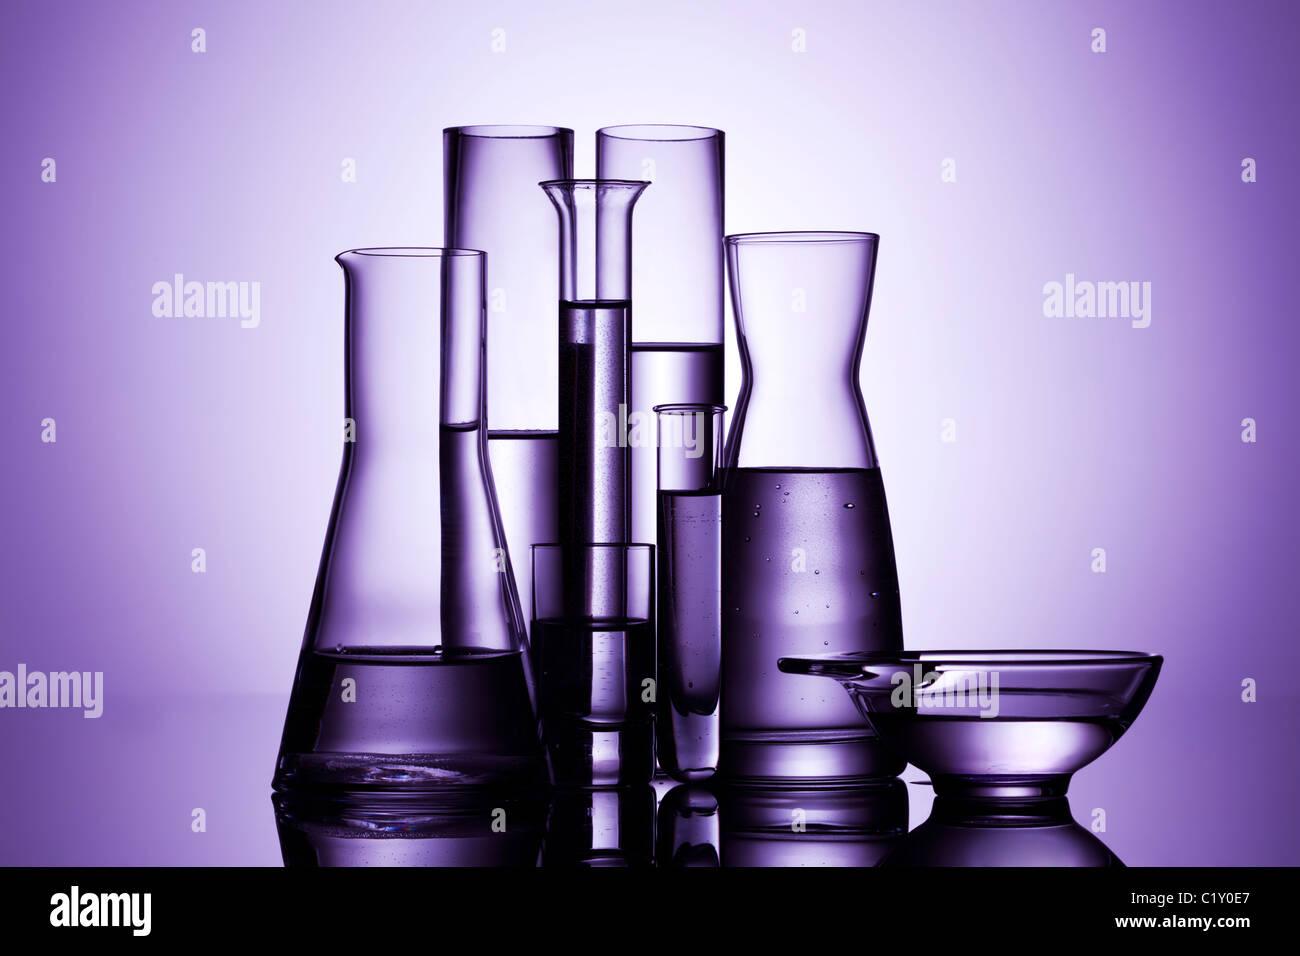 El material de vidrio de laboratorio, retroiluminado, luz púrpura Imagen De Stock